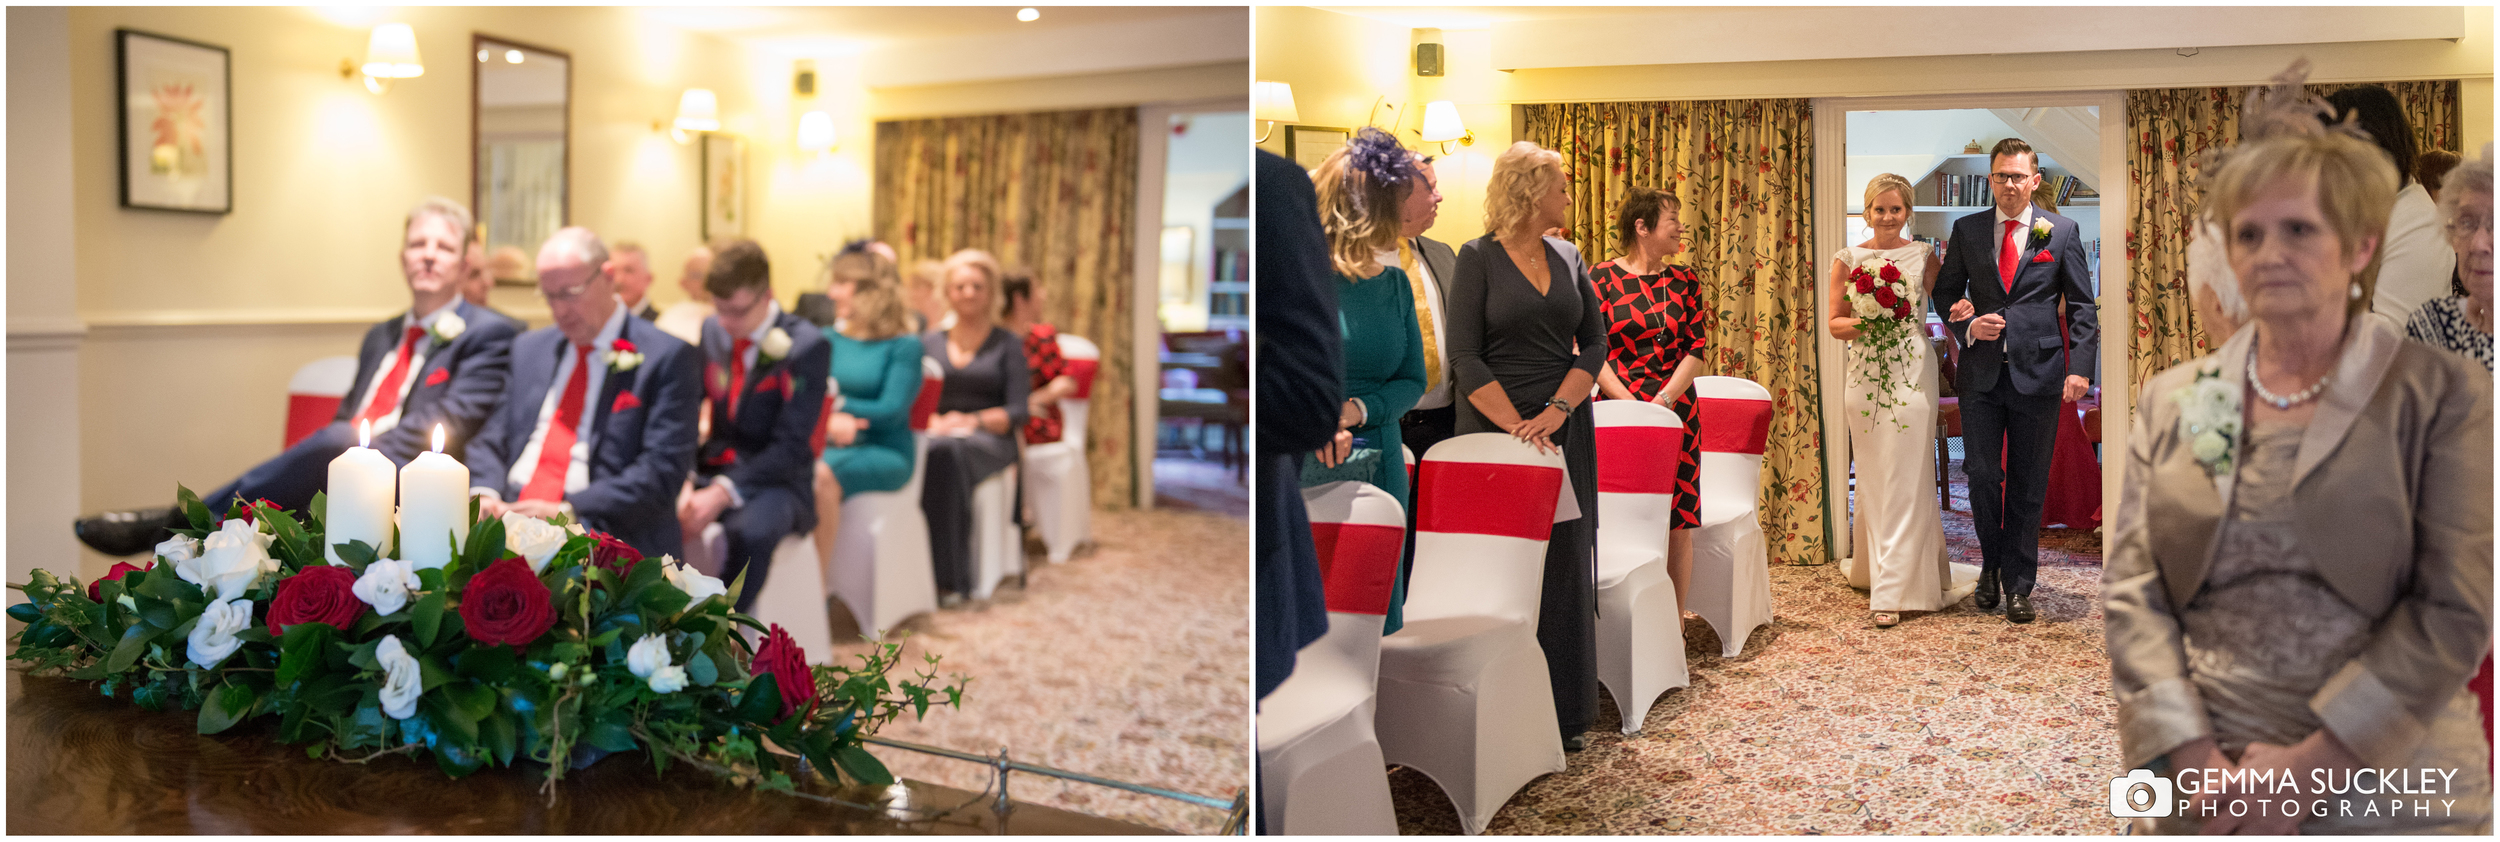 holdsworth-house-wedding-ceremony.jpg